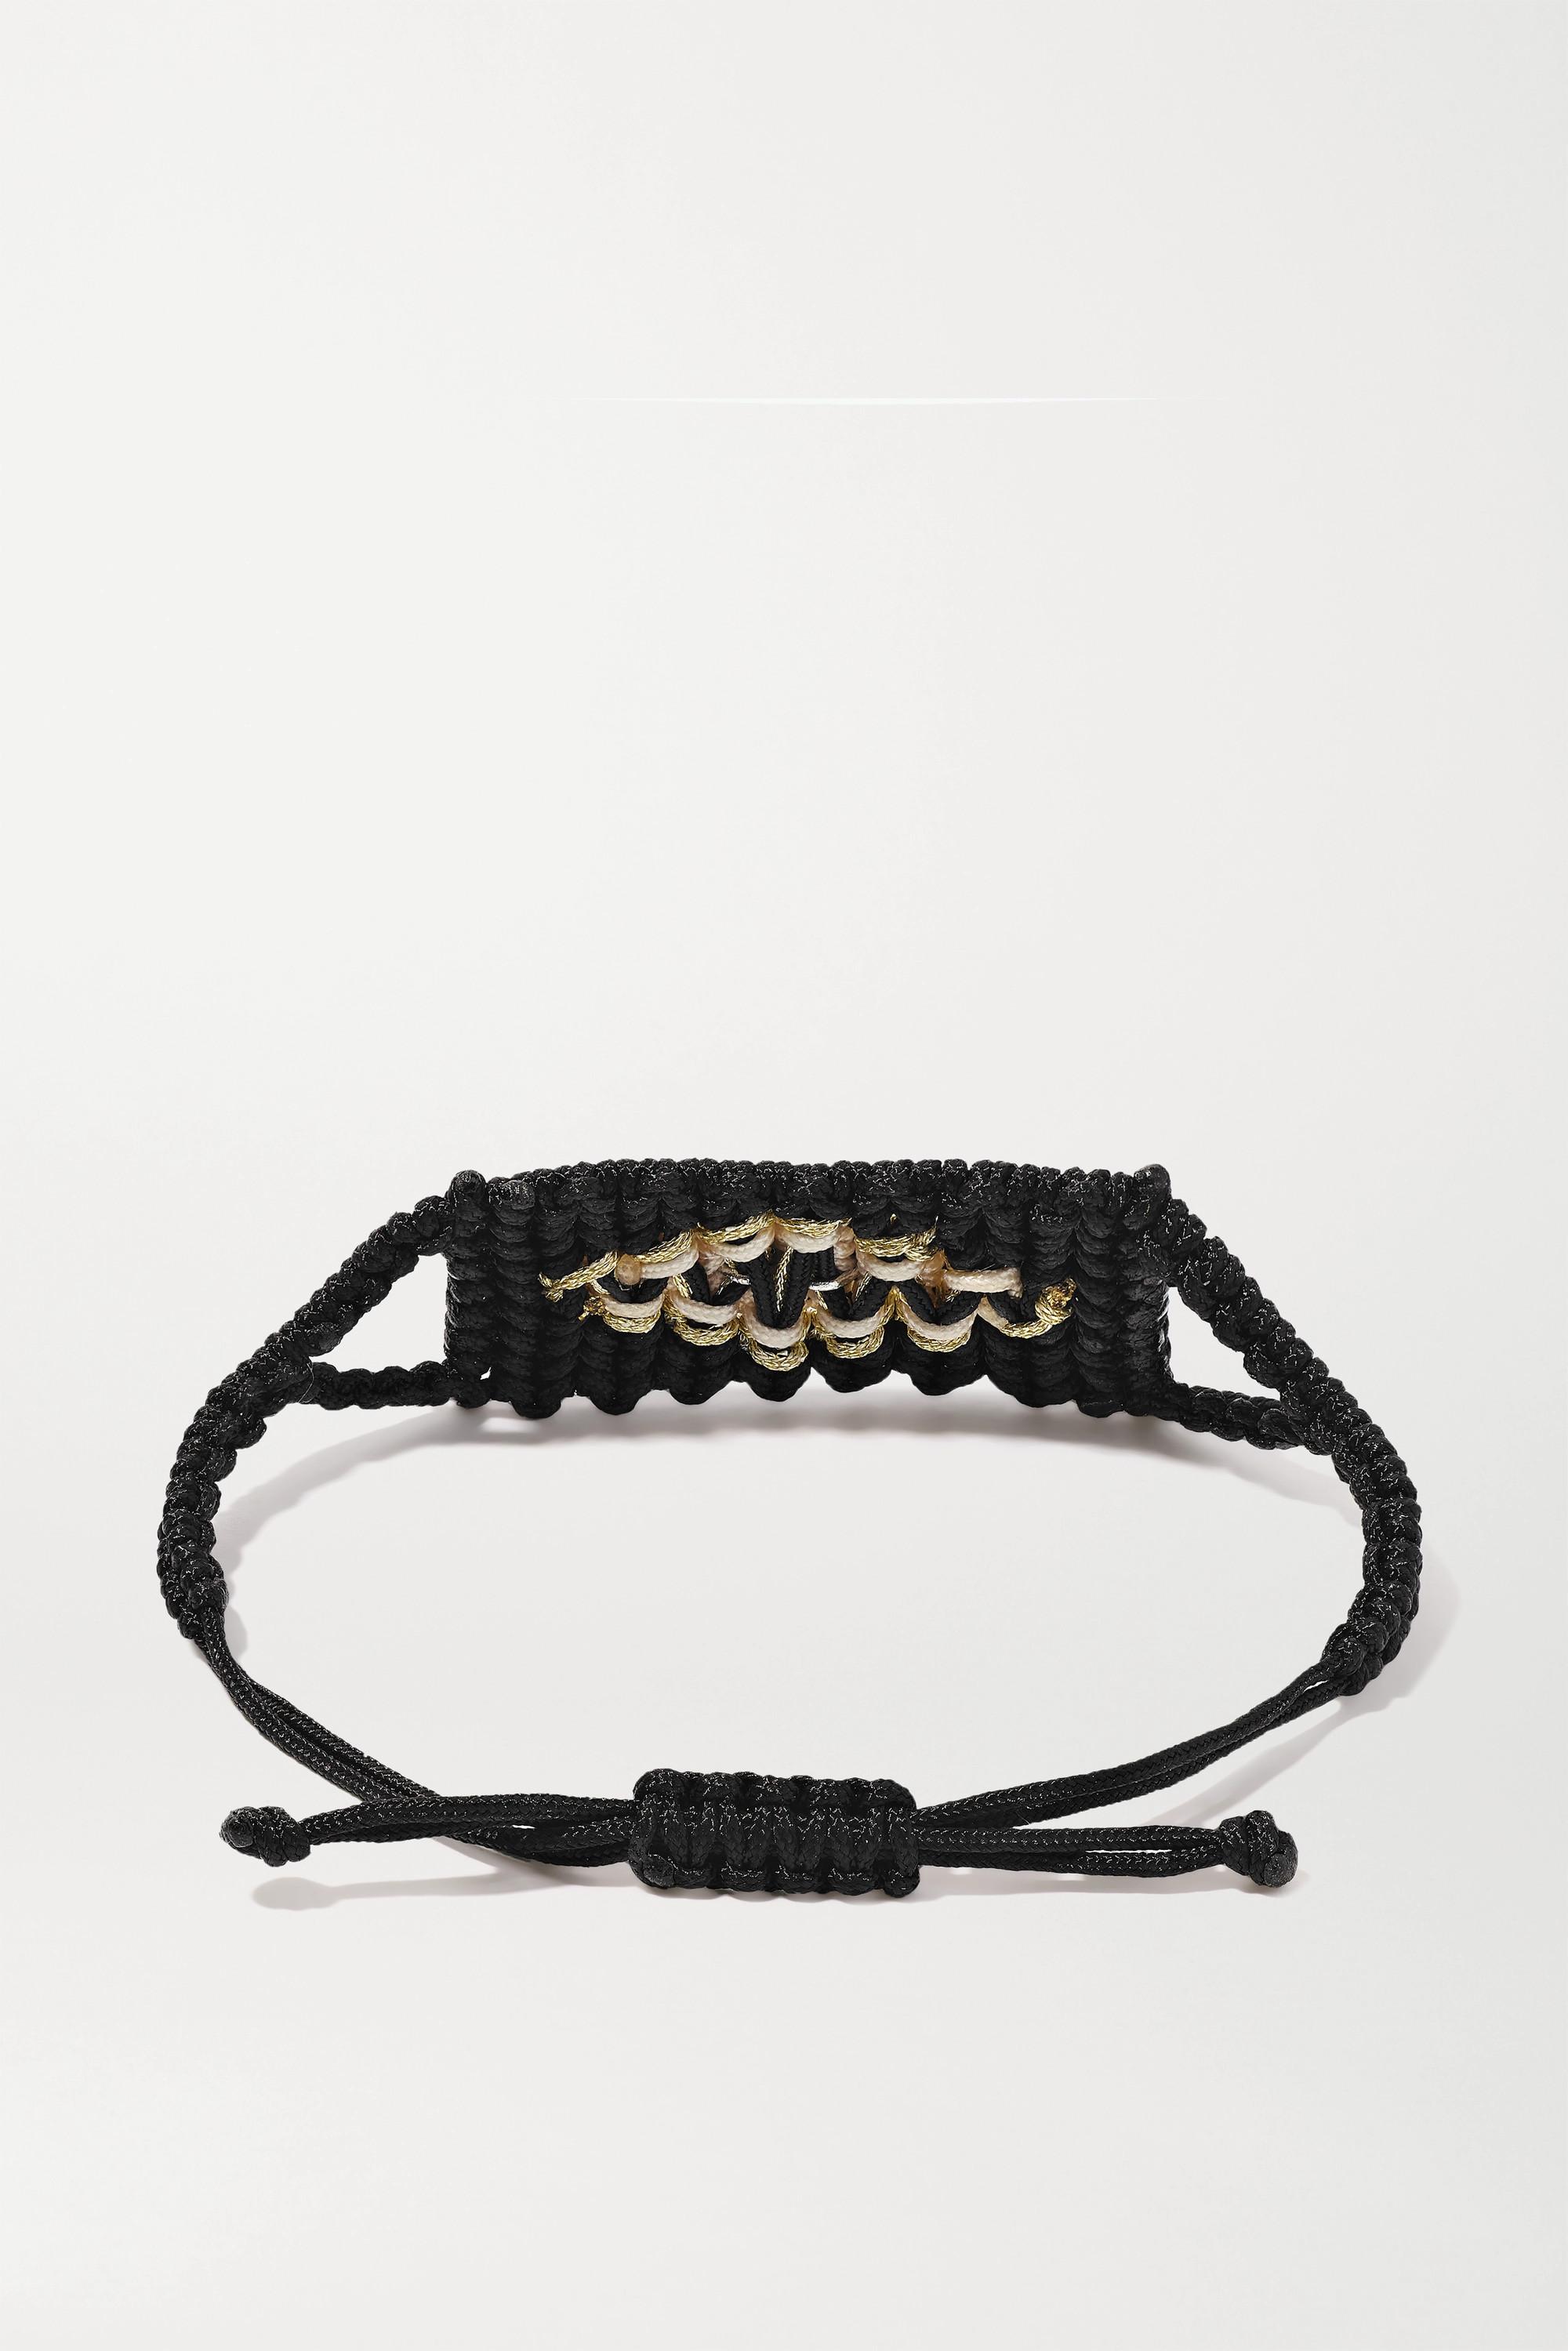 Diane Kordas Bracelet en corde tressée, diamants et saphirs Evil Eye